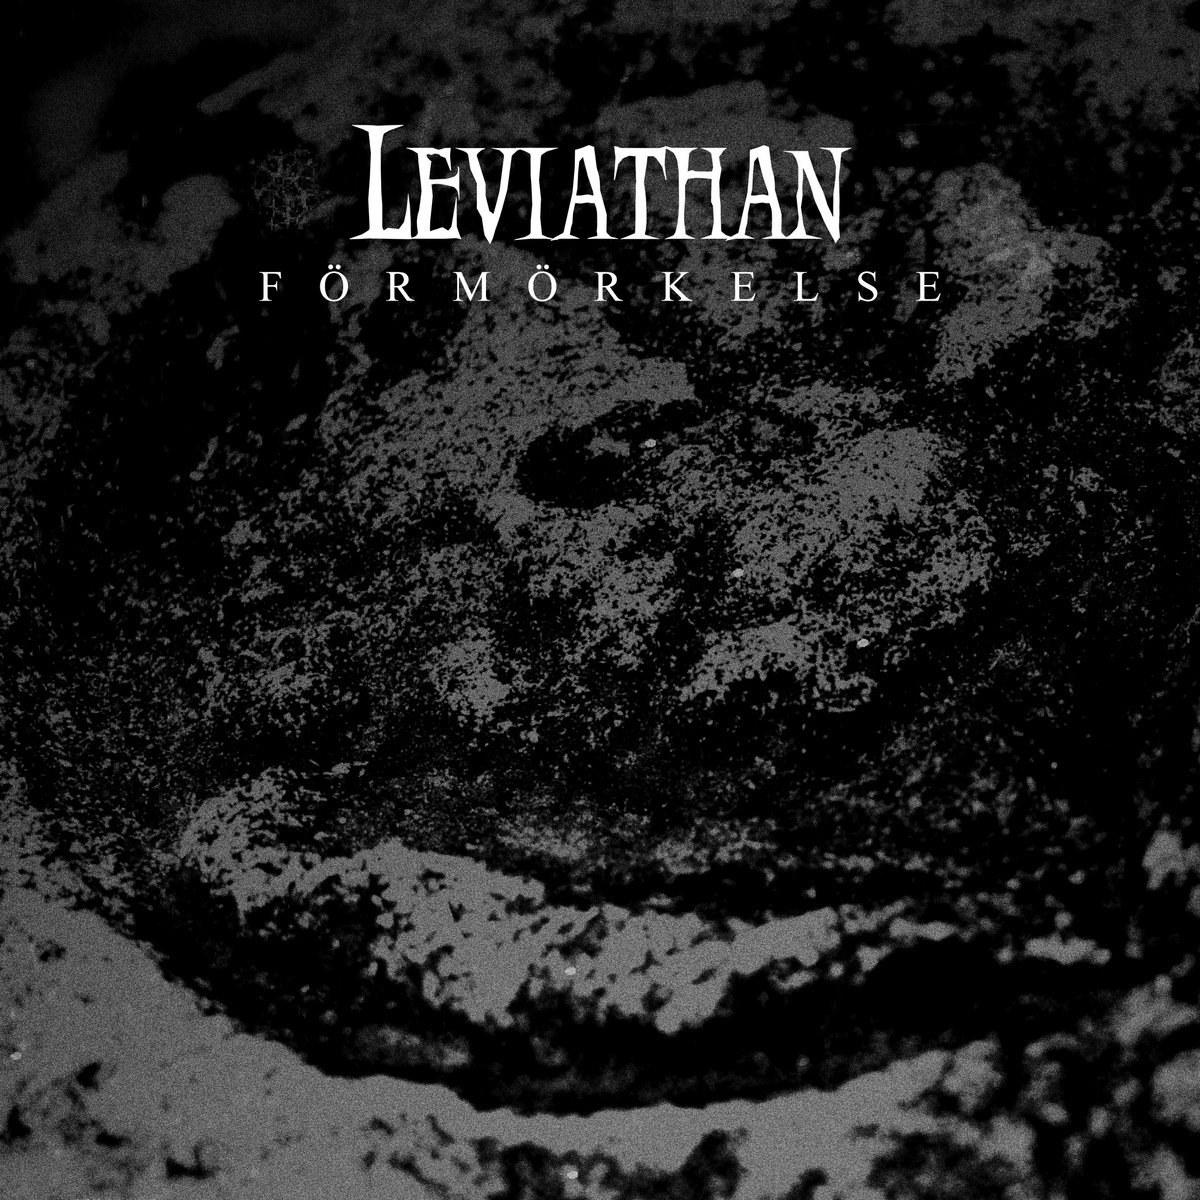 Review for Leviathan (SWE) - Förmörkelse